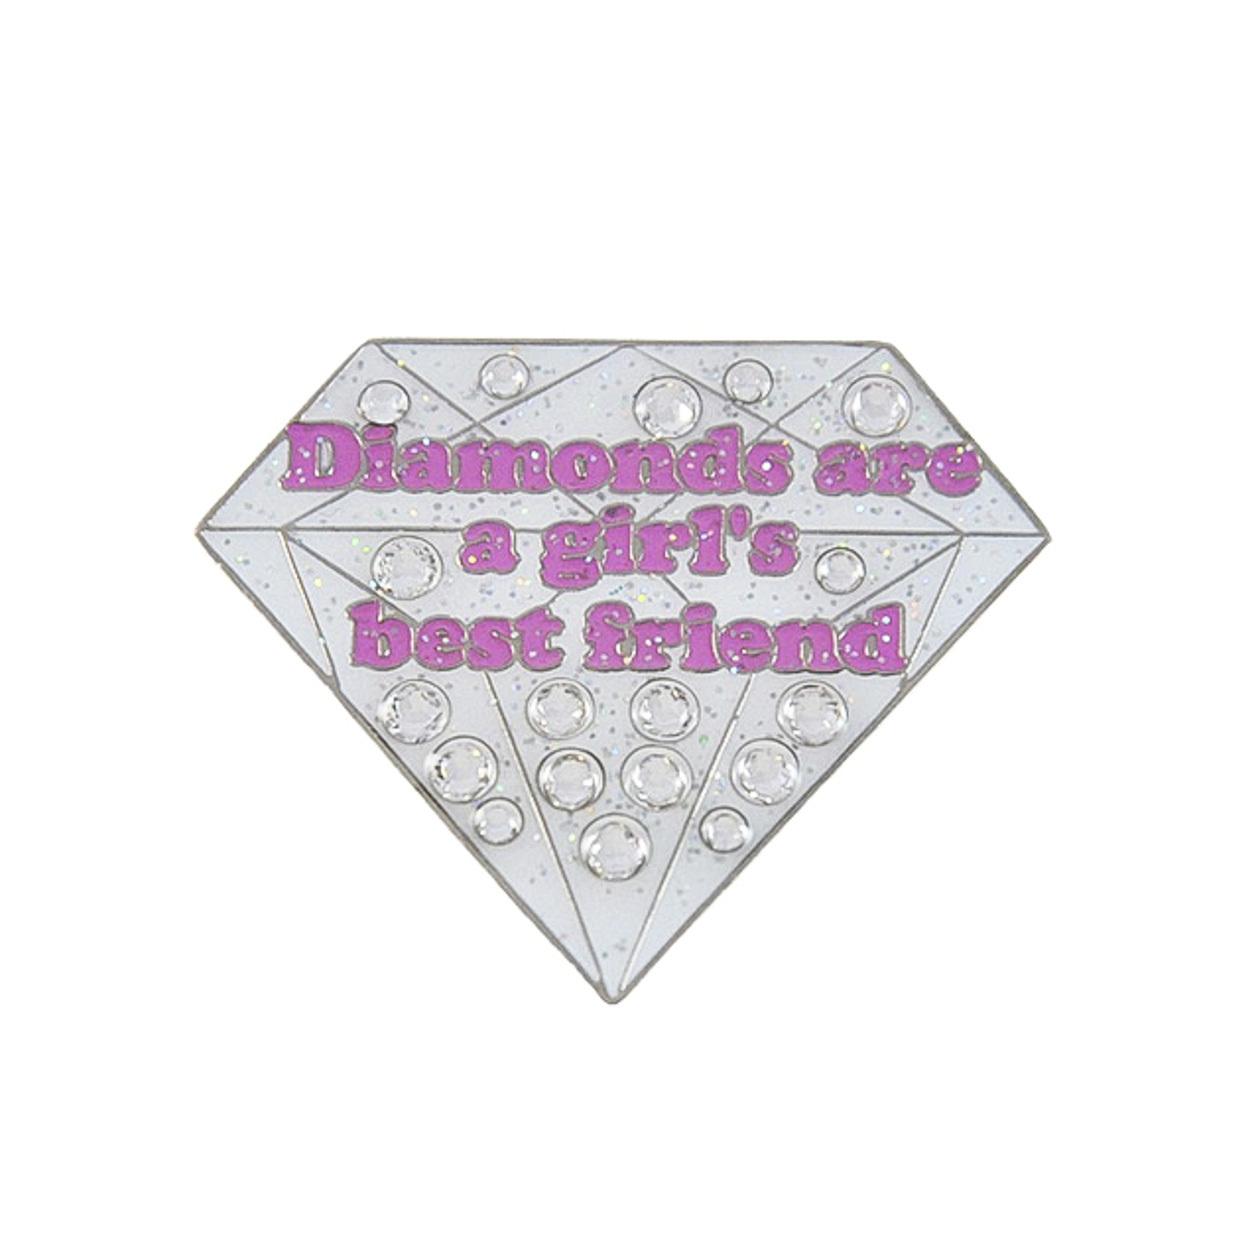 61. Diamonds